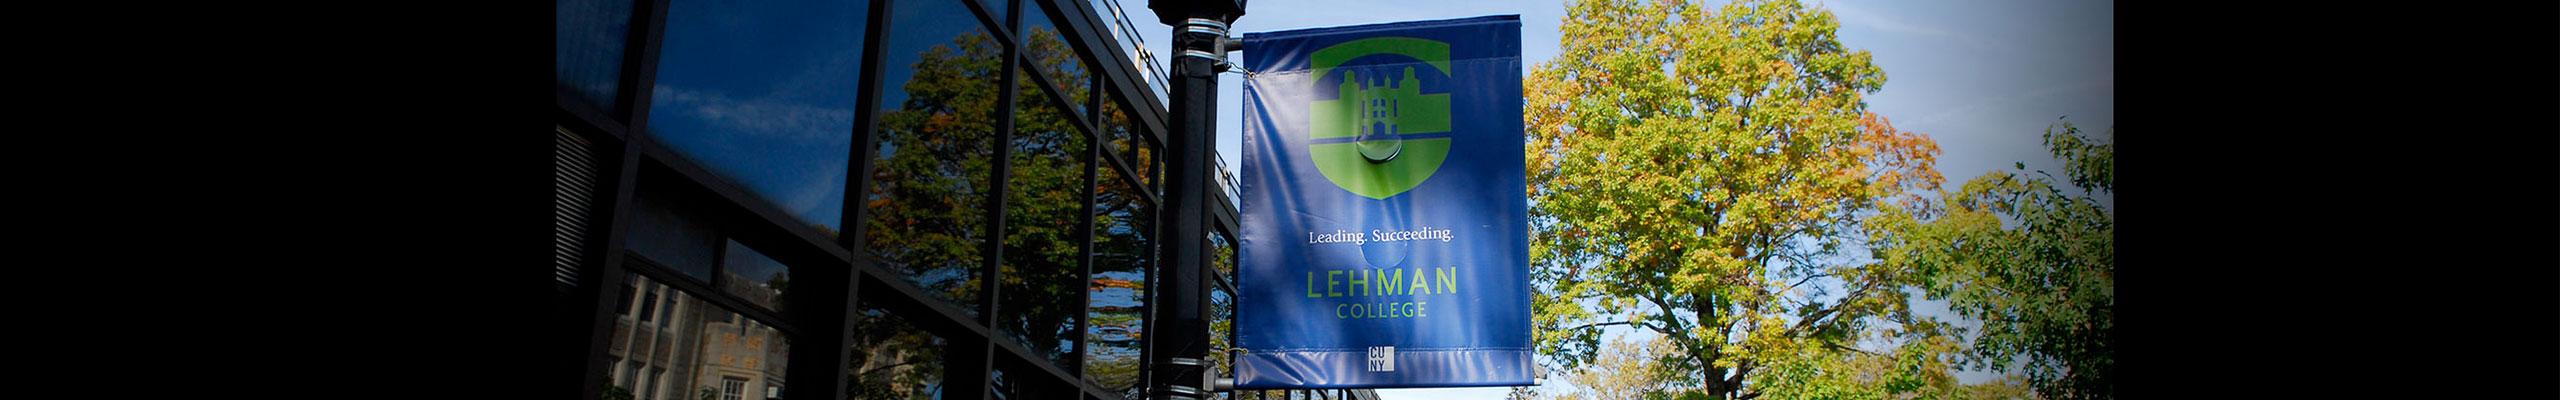 Lehman College Spring 2021 Calendar College Now Program   Lehman College